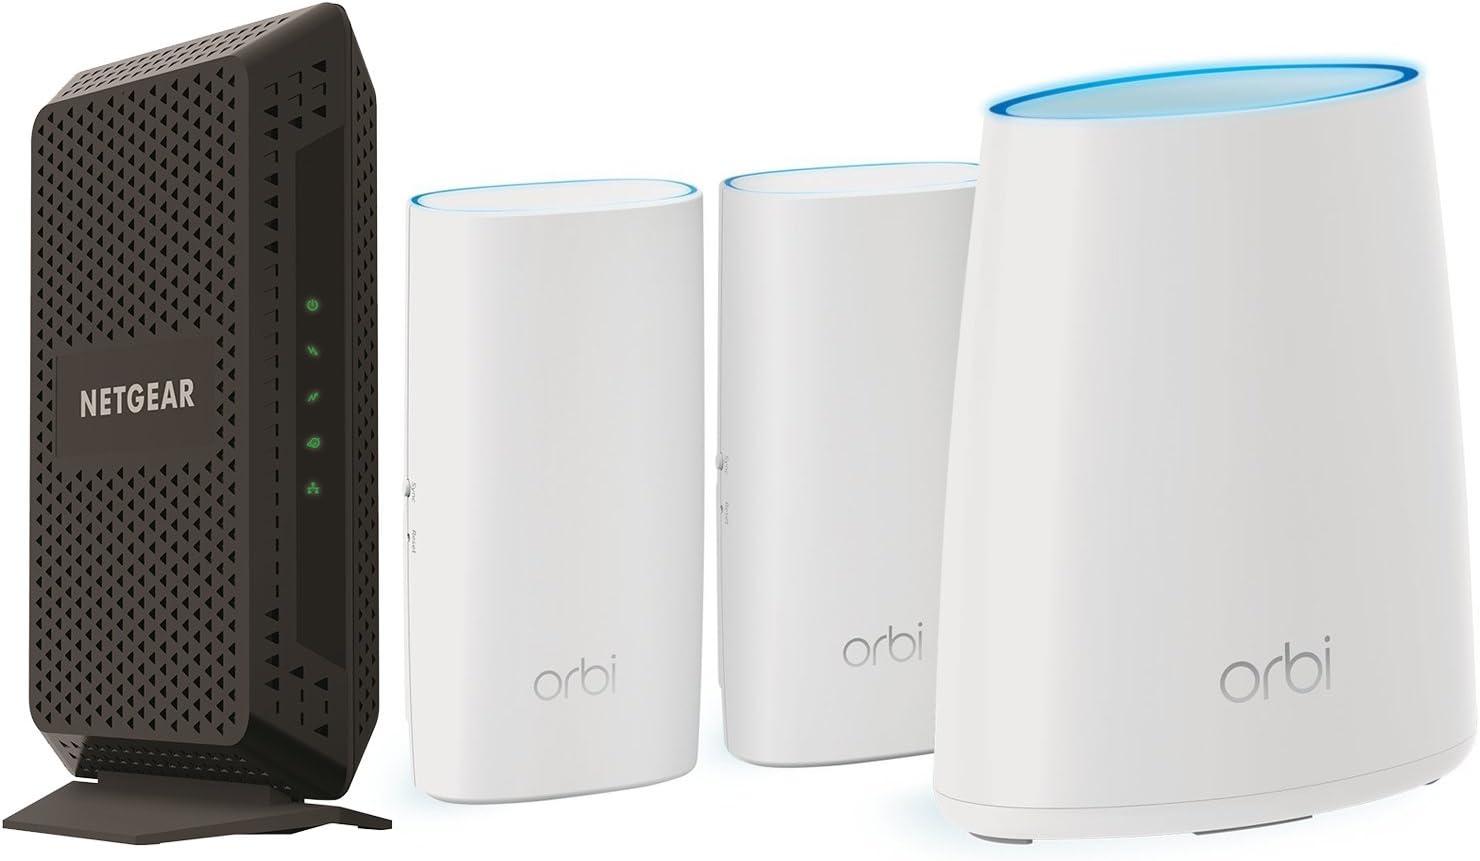 NETGEAR Orbi WallPlug Whole Home Mesh WiFi System Router /& 2 Satellites RBK33